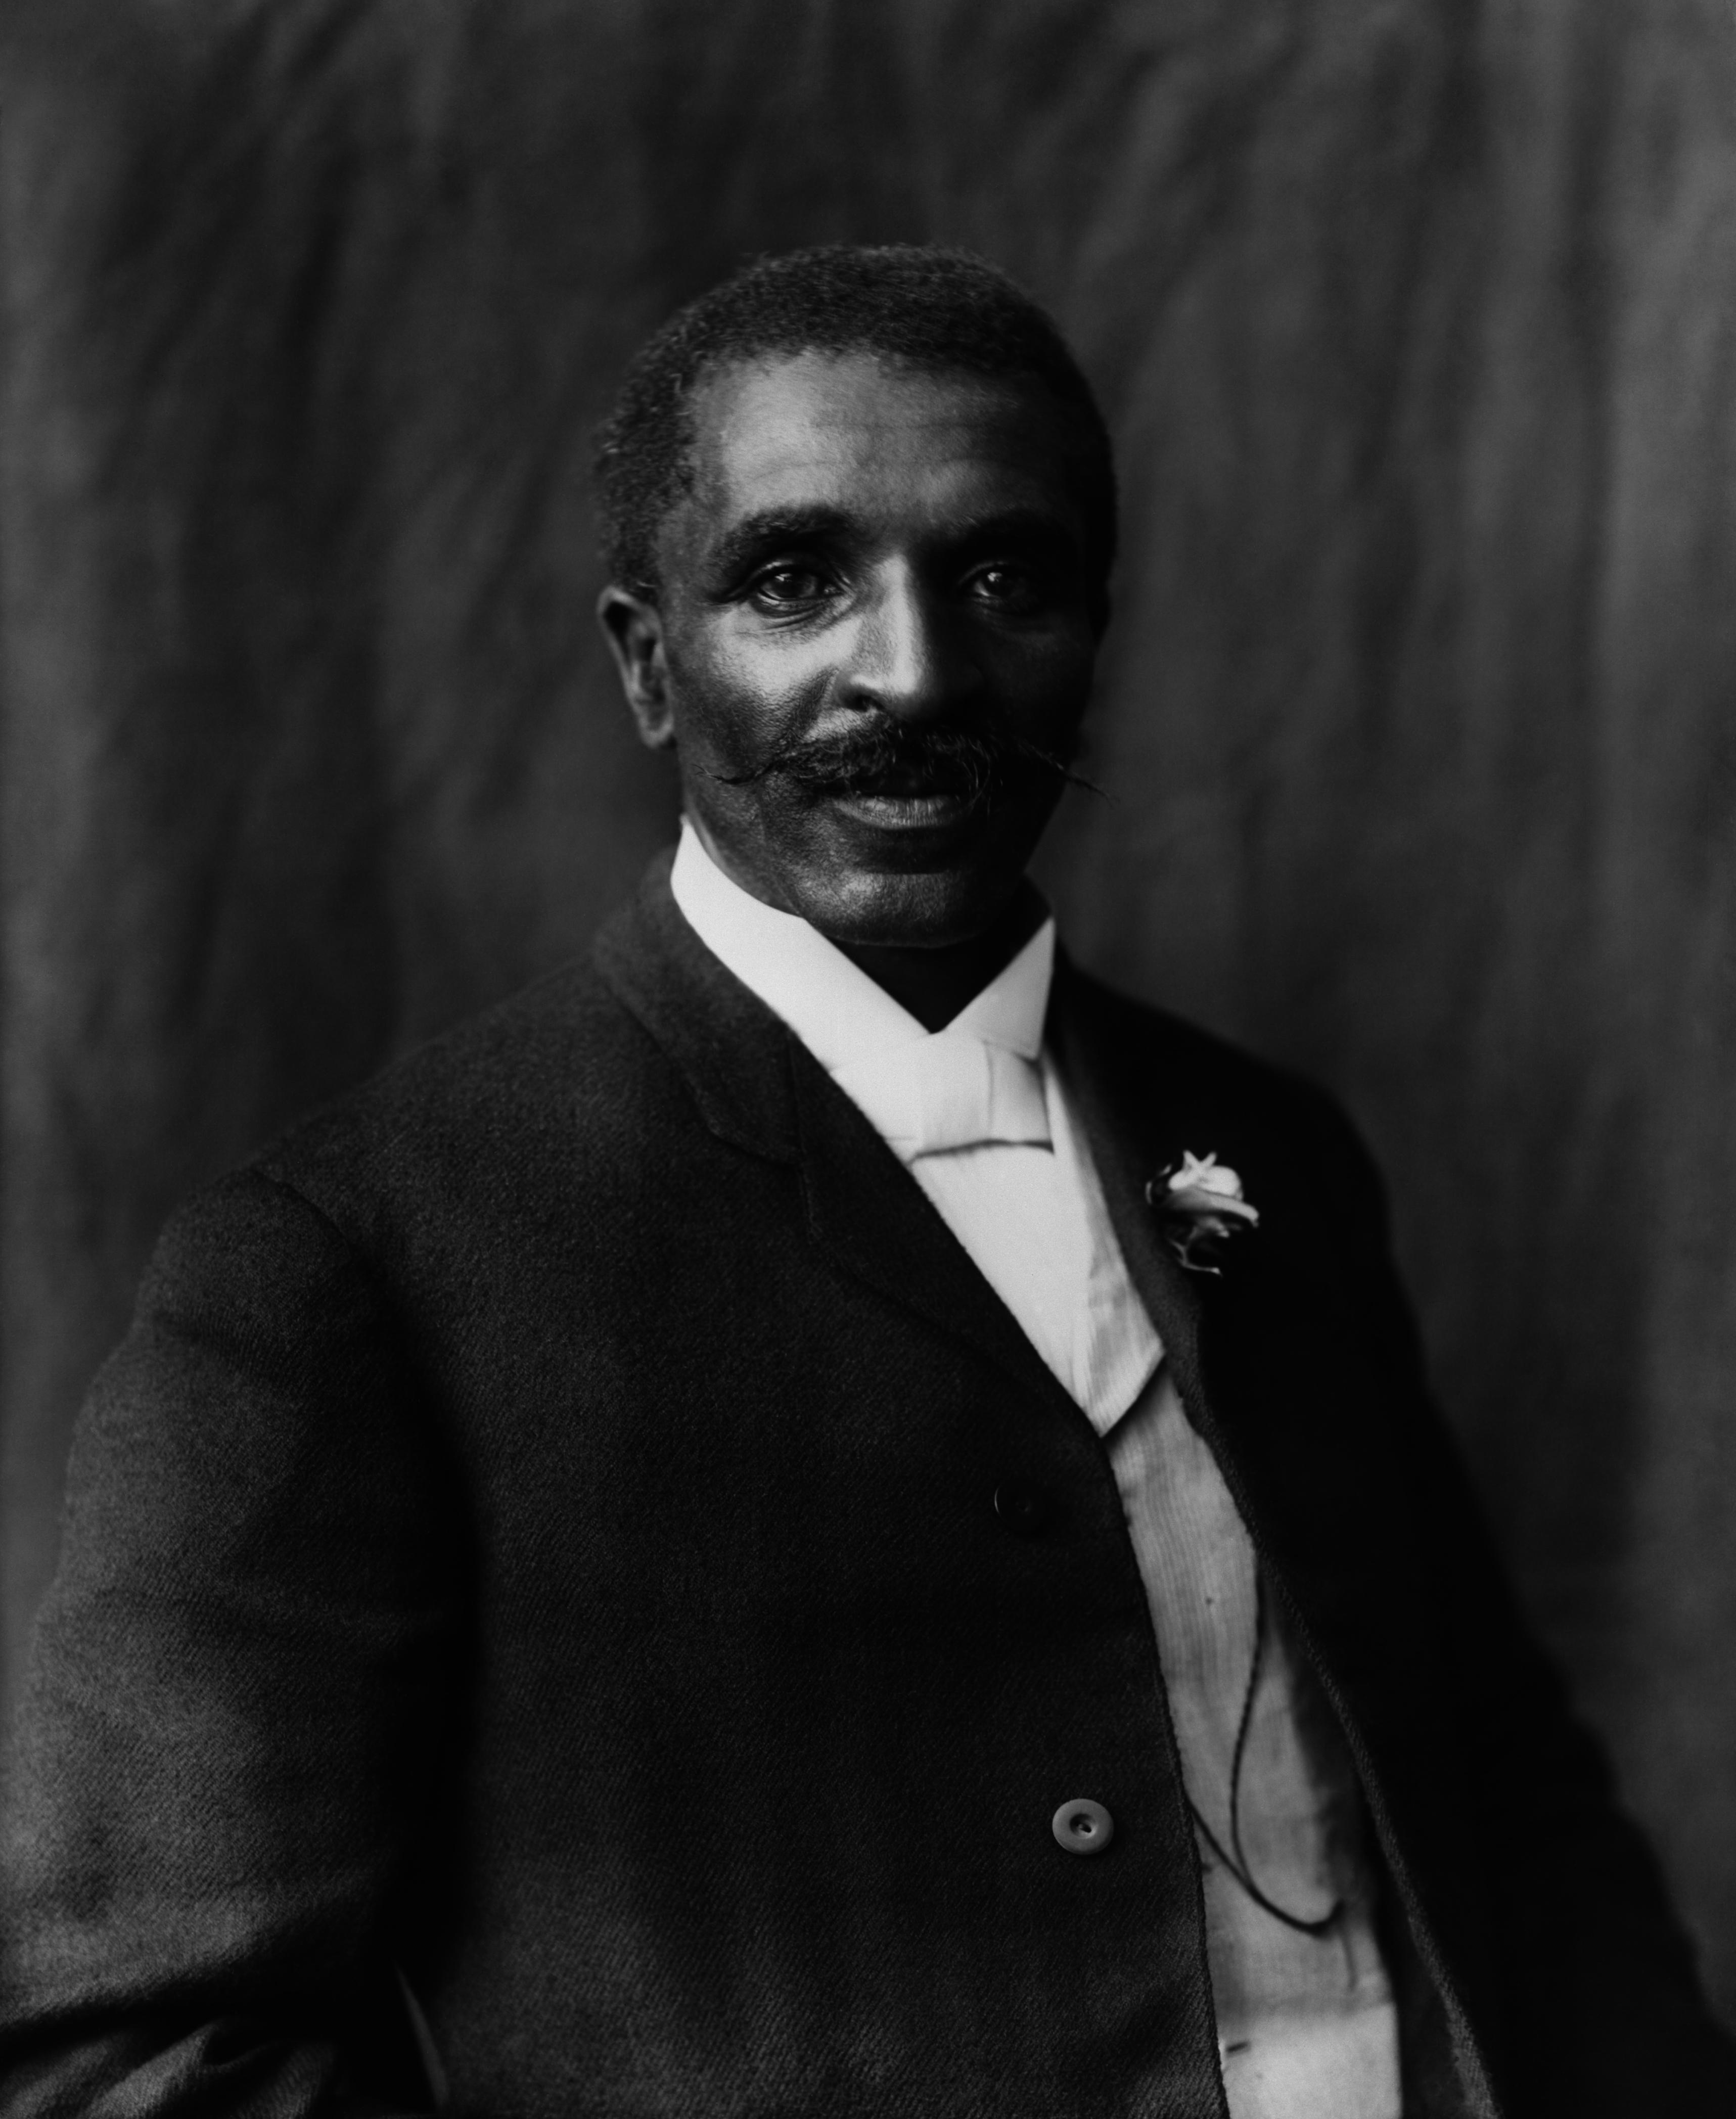 Depiction of George Washington Carver